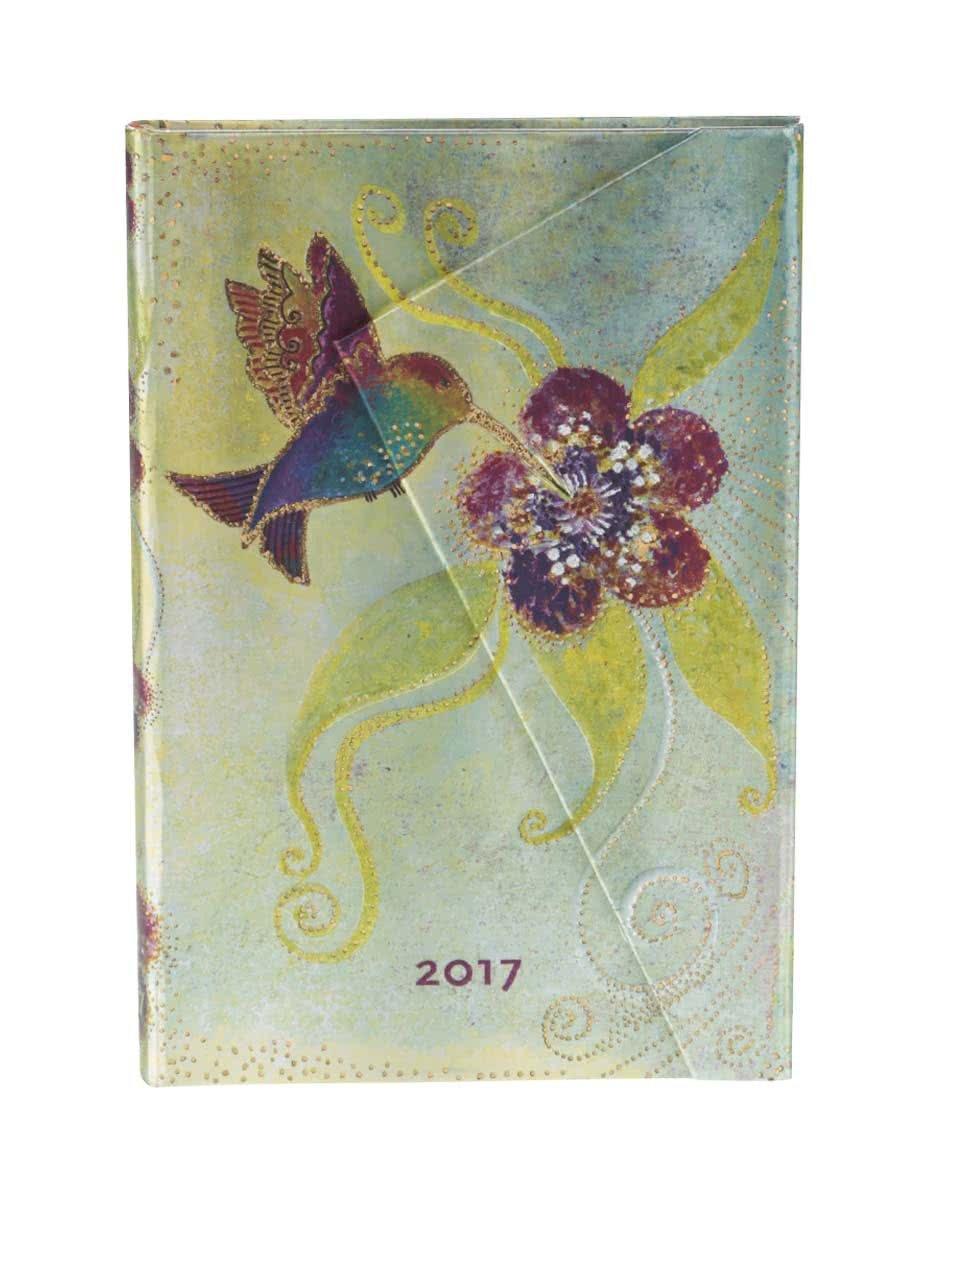 Růžovo-zelený diář s kolibříkem na rok 2017 Paperblanks Hummingbird Mini